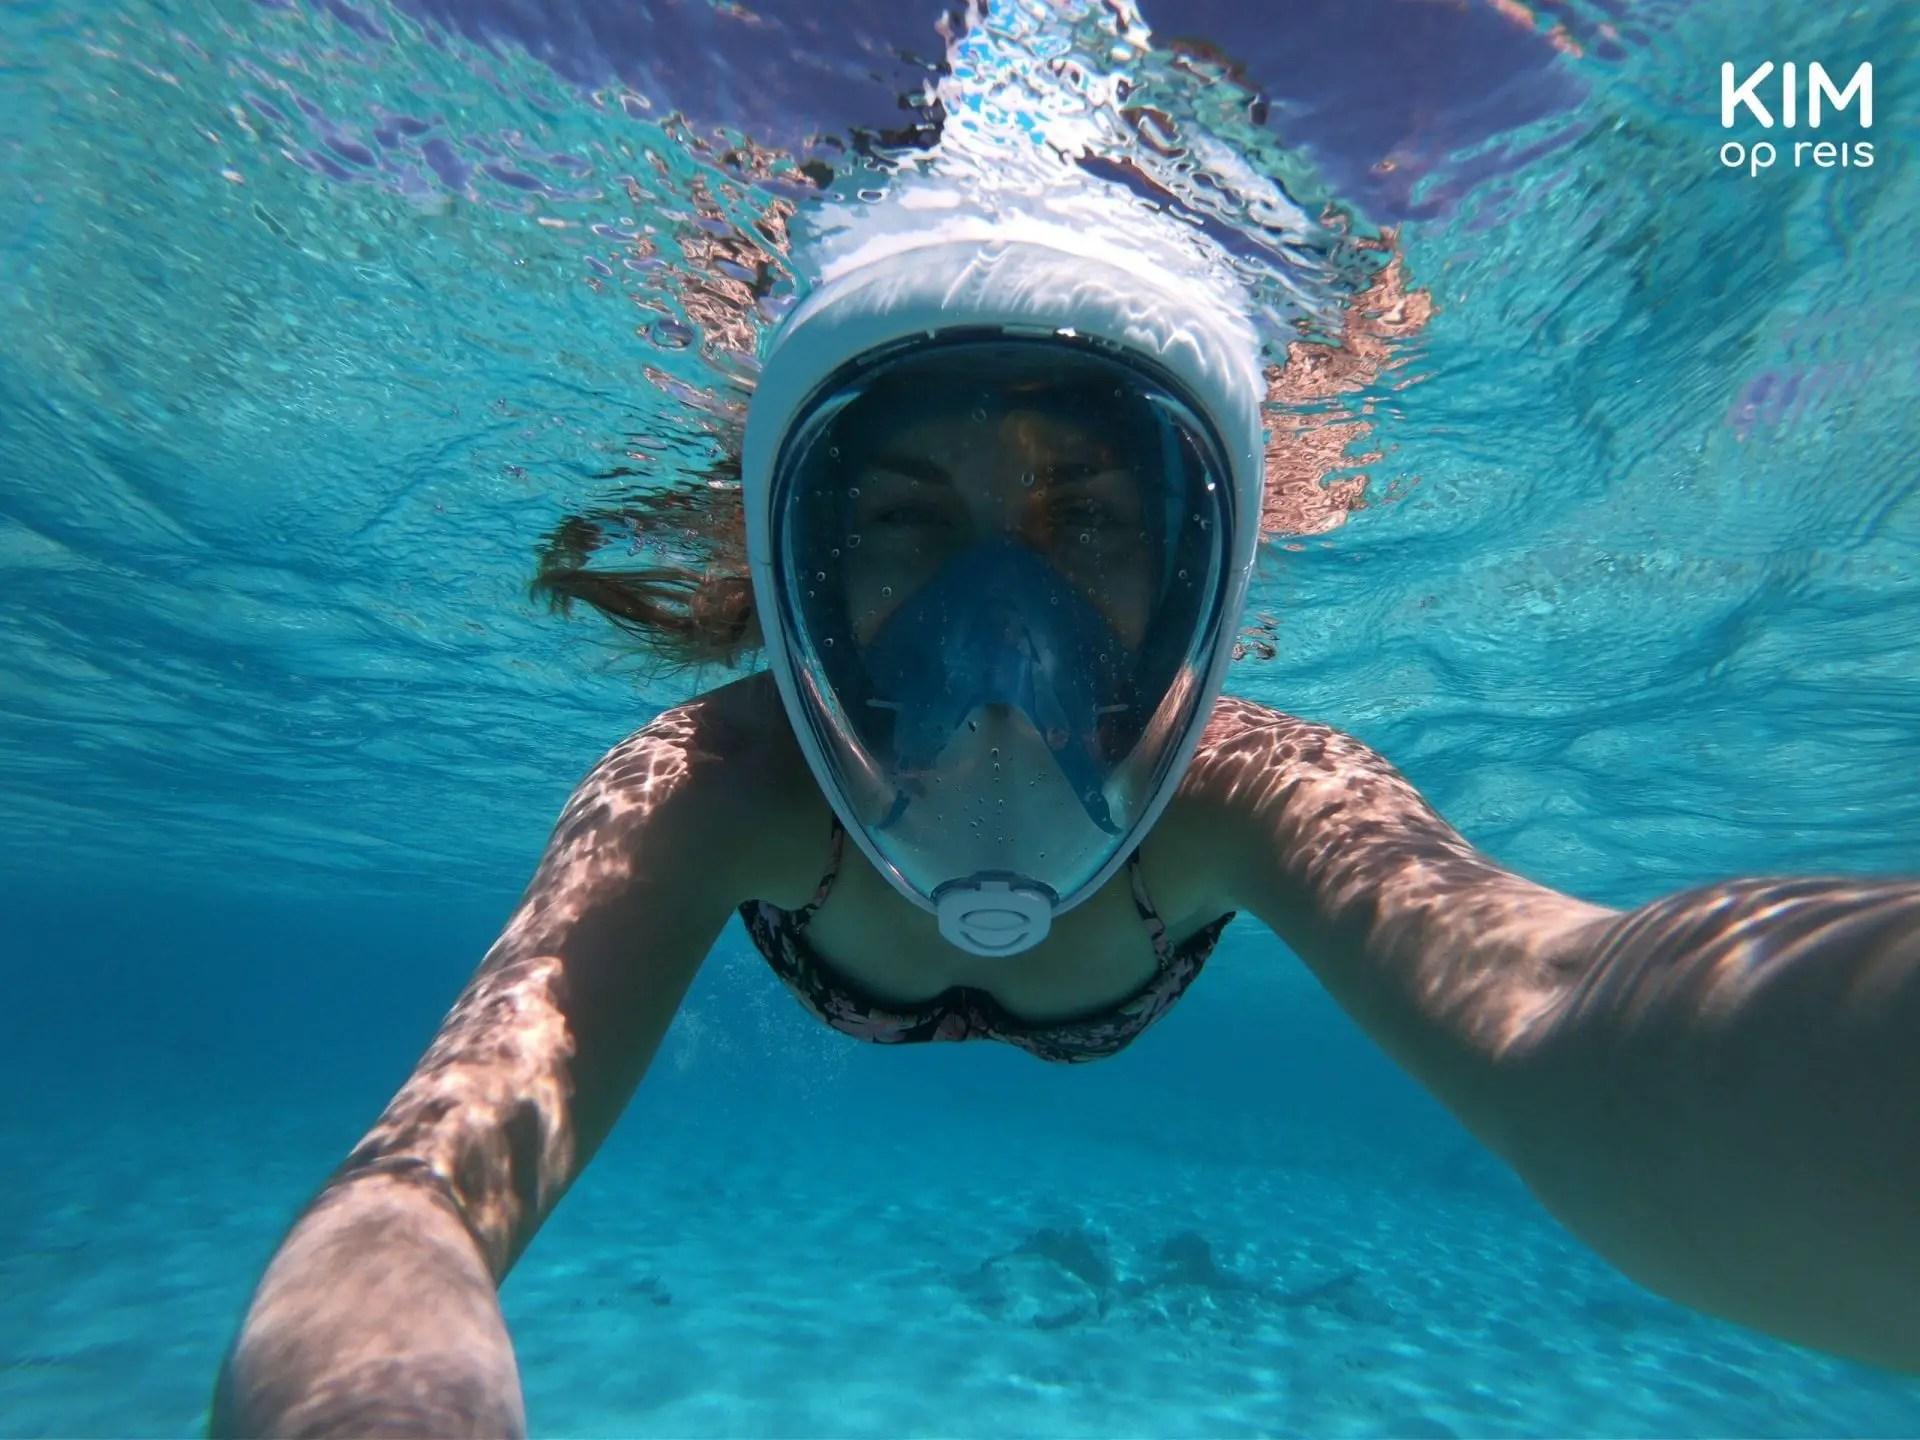 Snorkeling on Klein Curaçao: underwater selfie with snorkel mask